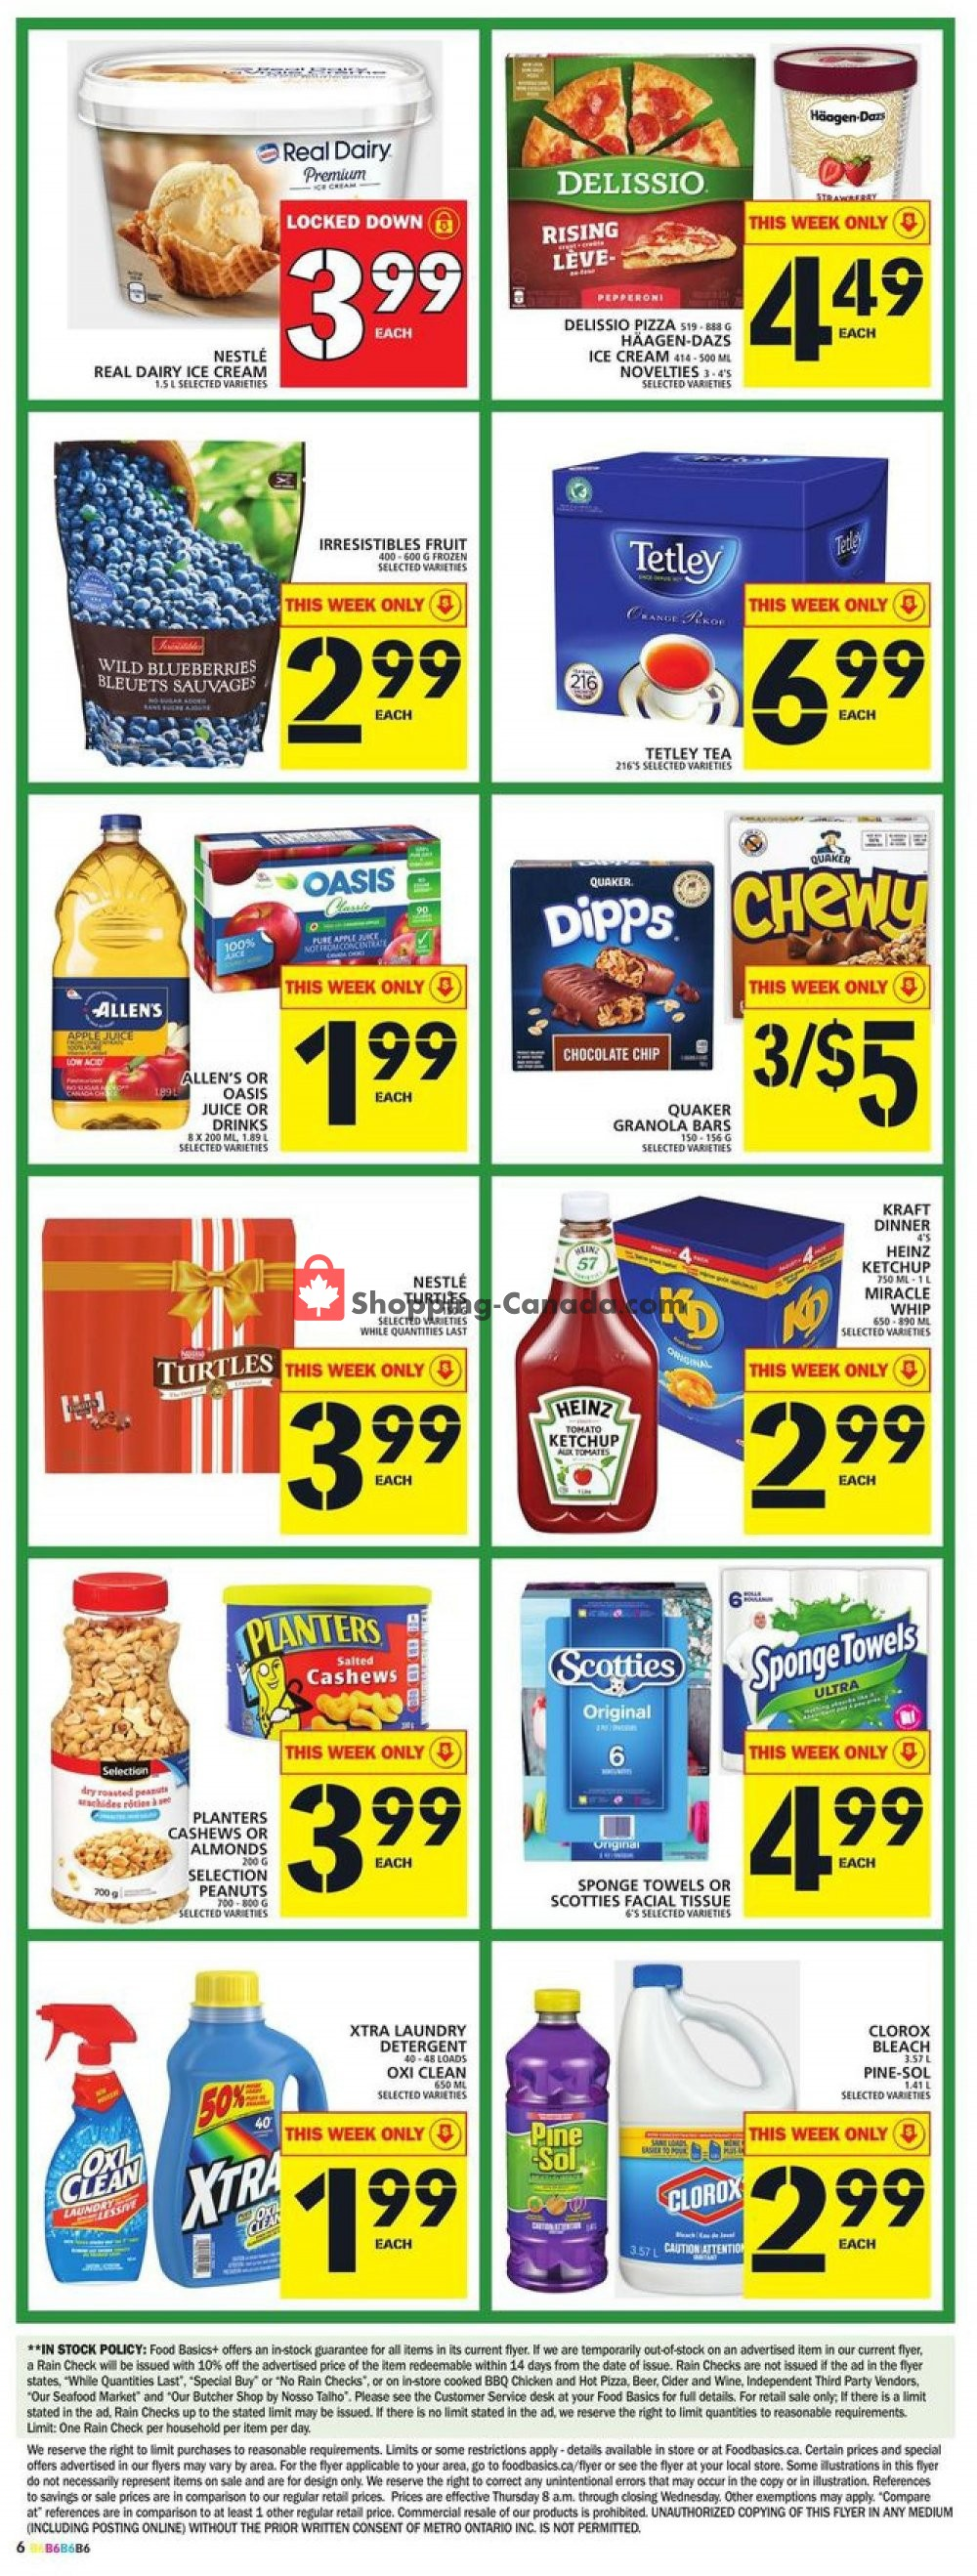 Flyer Food Basics Canada - from Thursday November 7, 2019 to Wednesday November 13, 2019